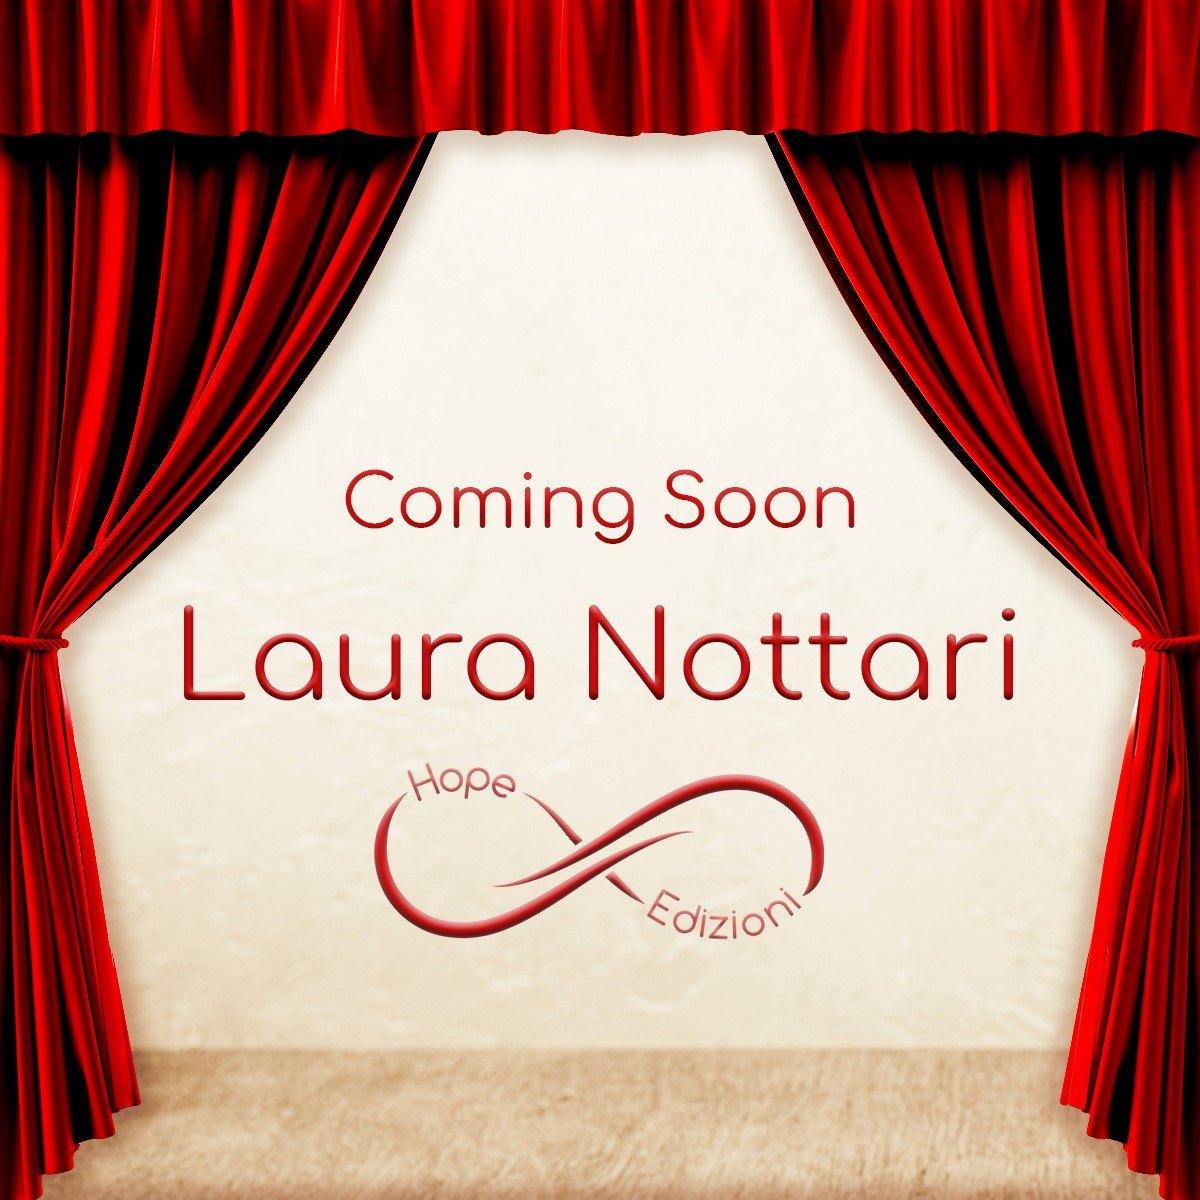 In arrivo… Laura Nottari!